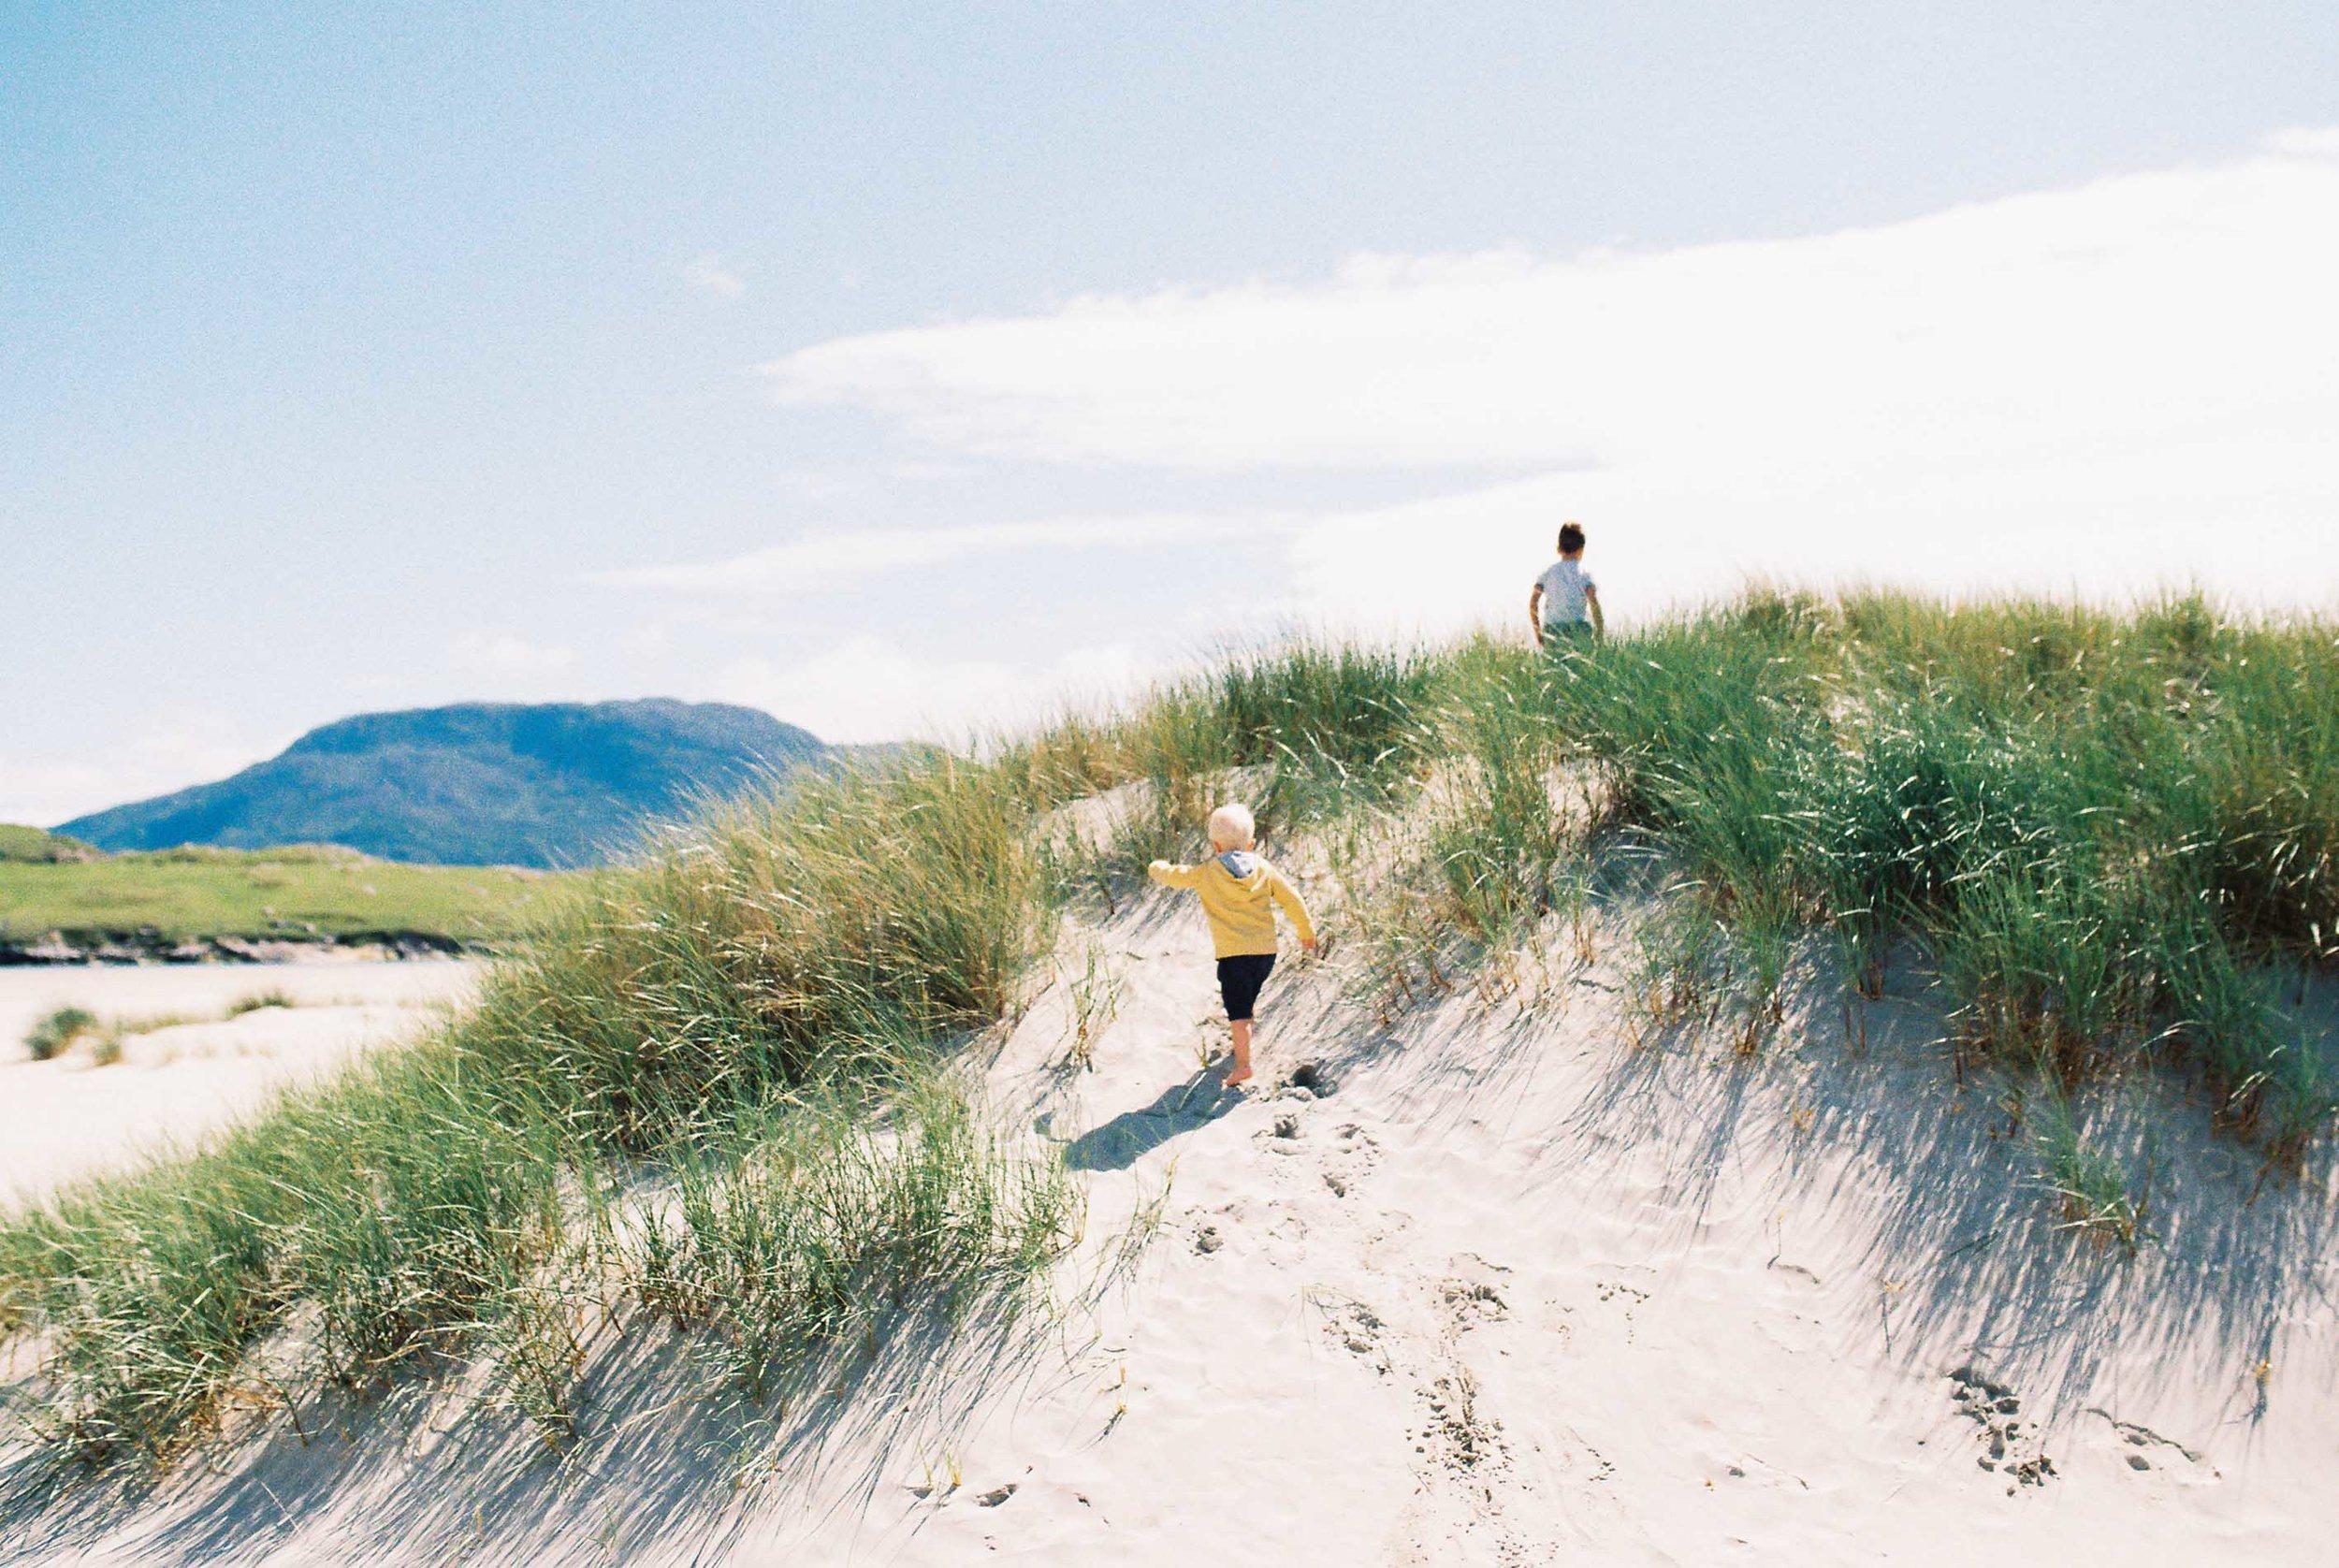 dunes of ireland on kodak by laura barr photography